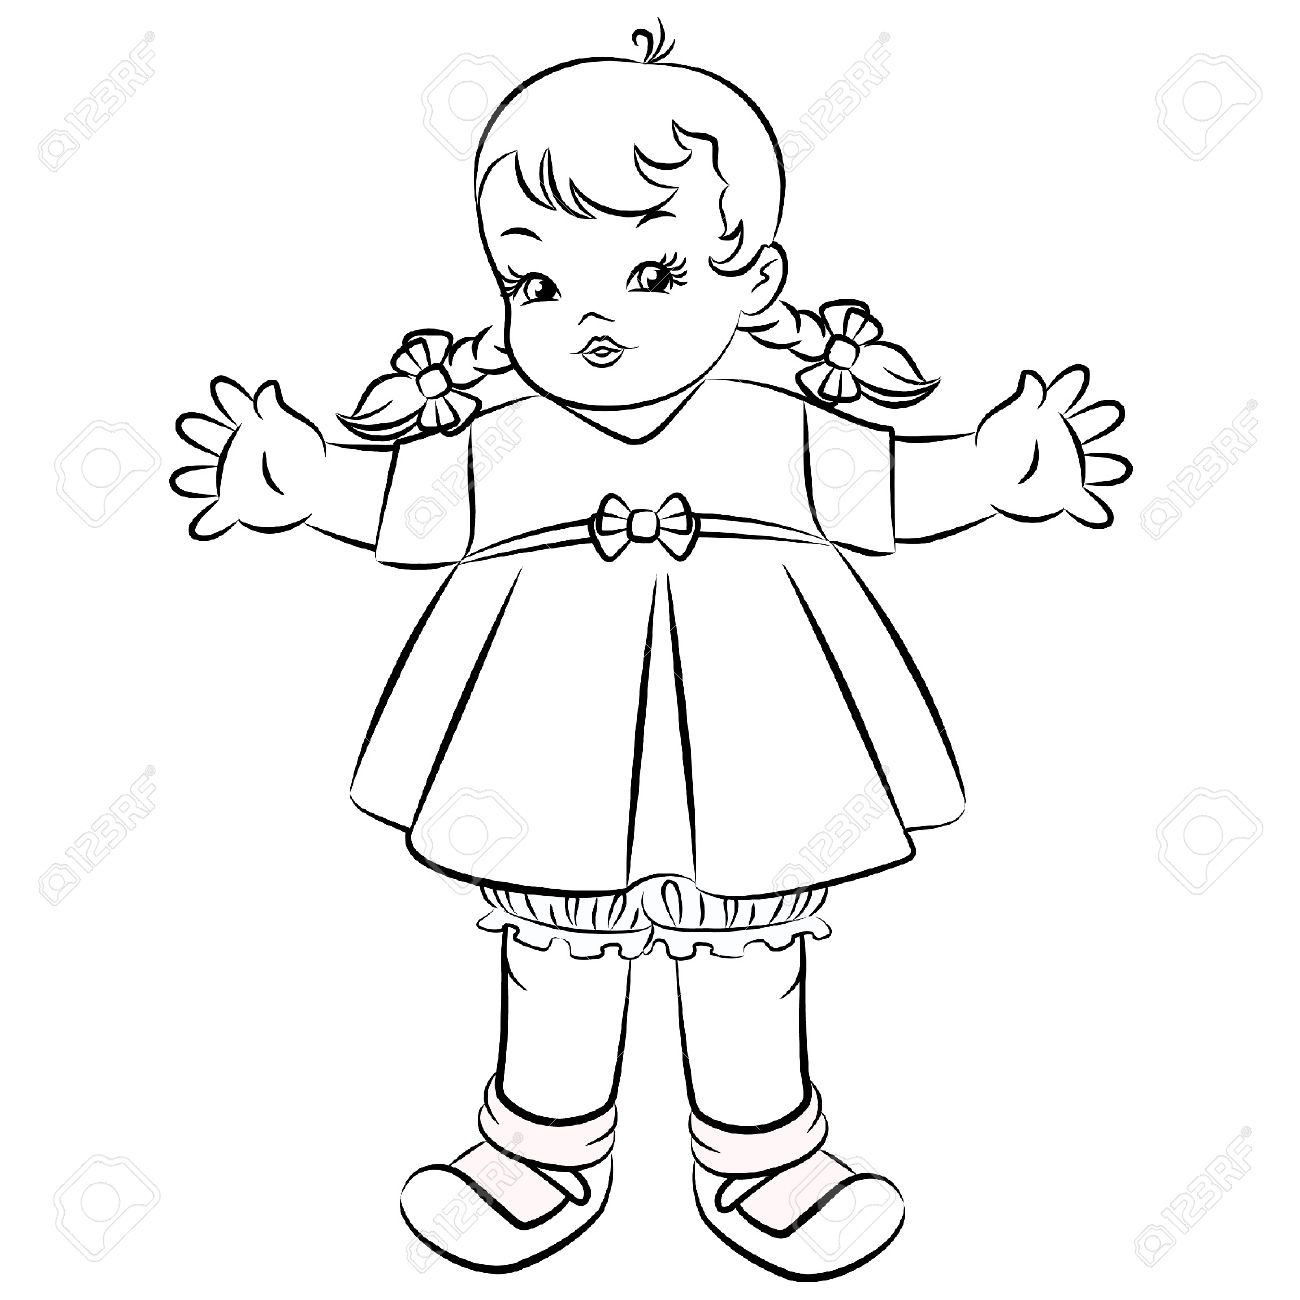 1300x1300 Little Girl Cartoon Drawing